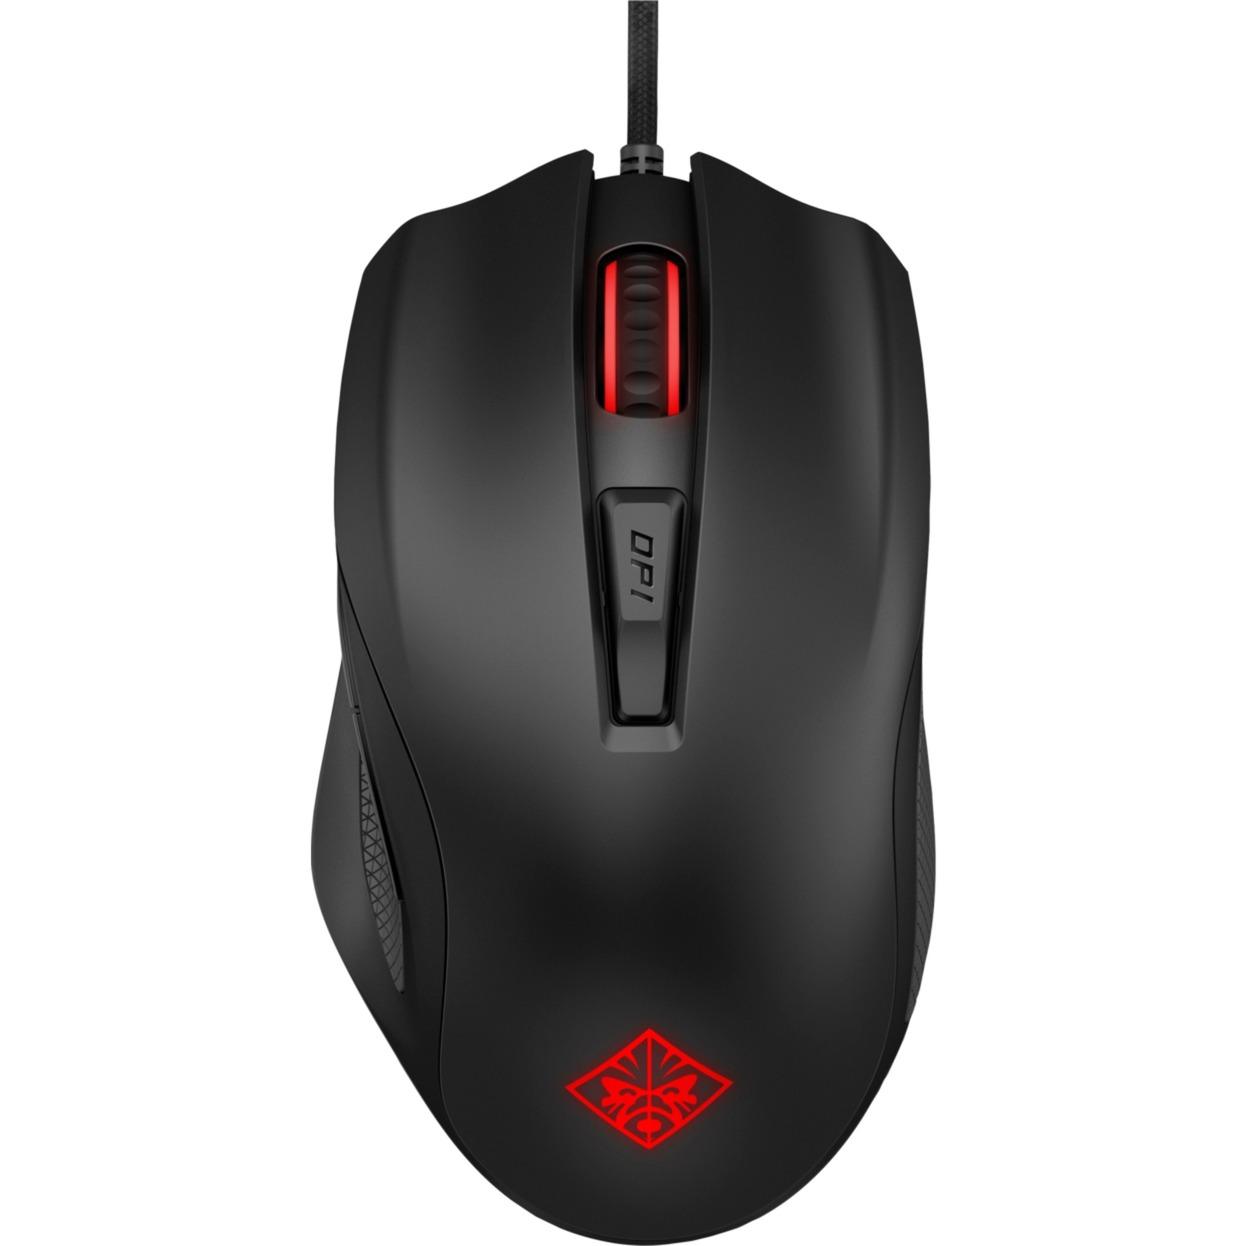 OMEN 600 ratón USB Óptico 12000 DPI mano derecha Negro